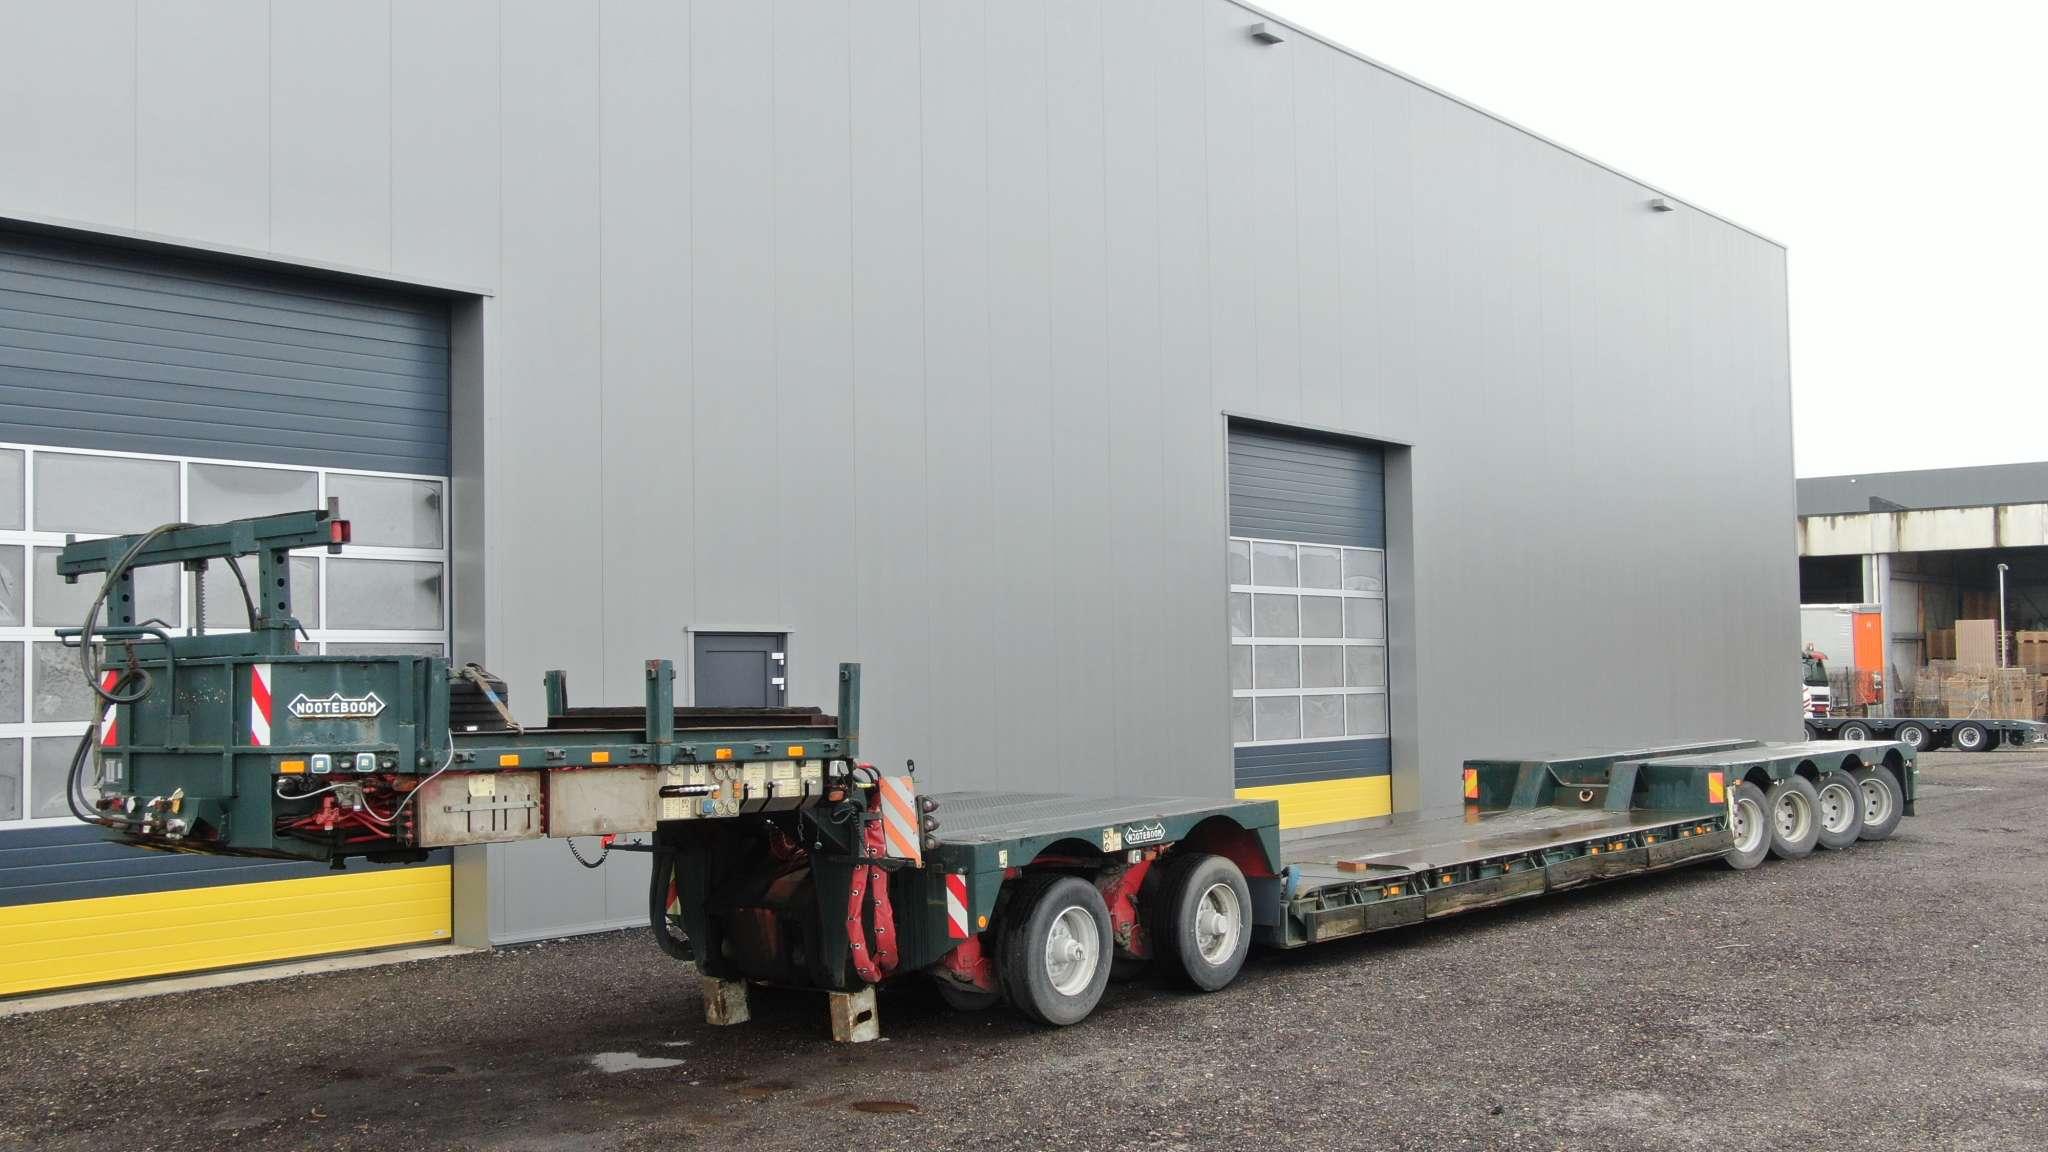 2 camas 4 | 4 ejes de góndola de cama baja incl. 2 ejes interdolly | carga útil 66 toneladas